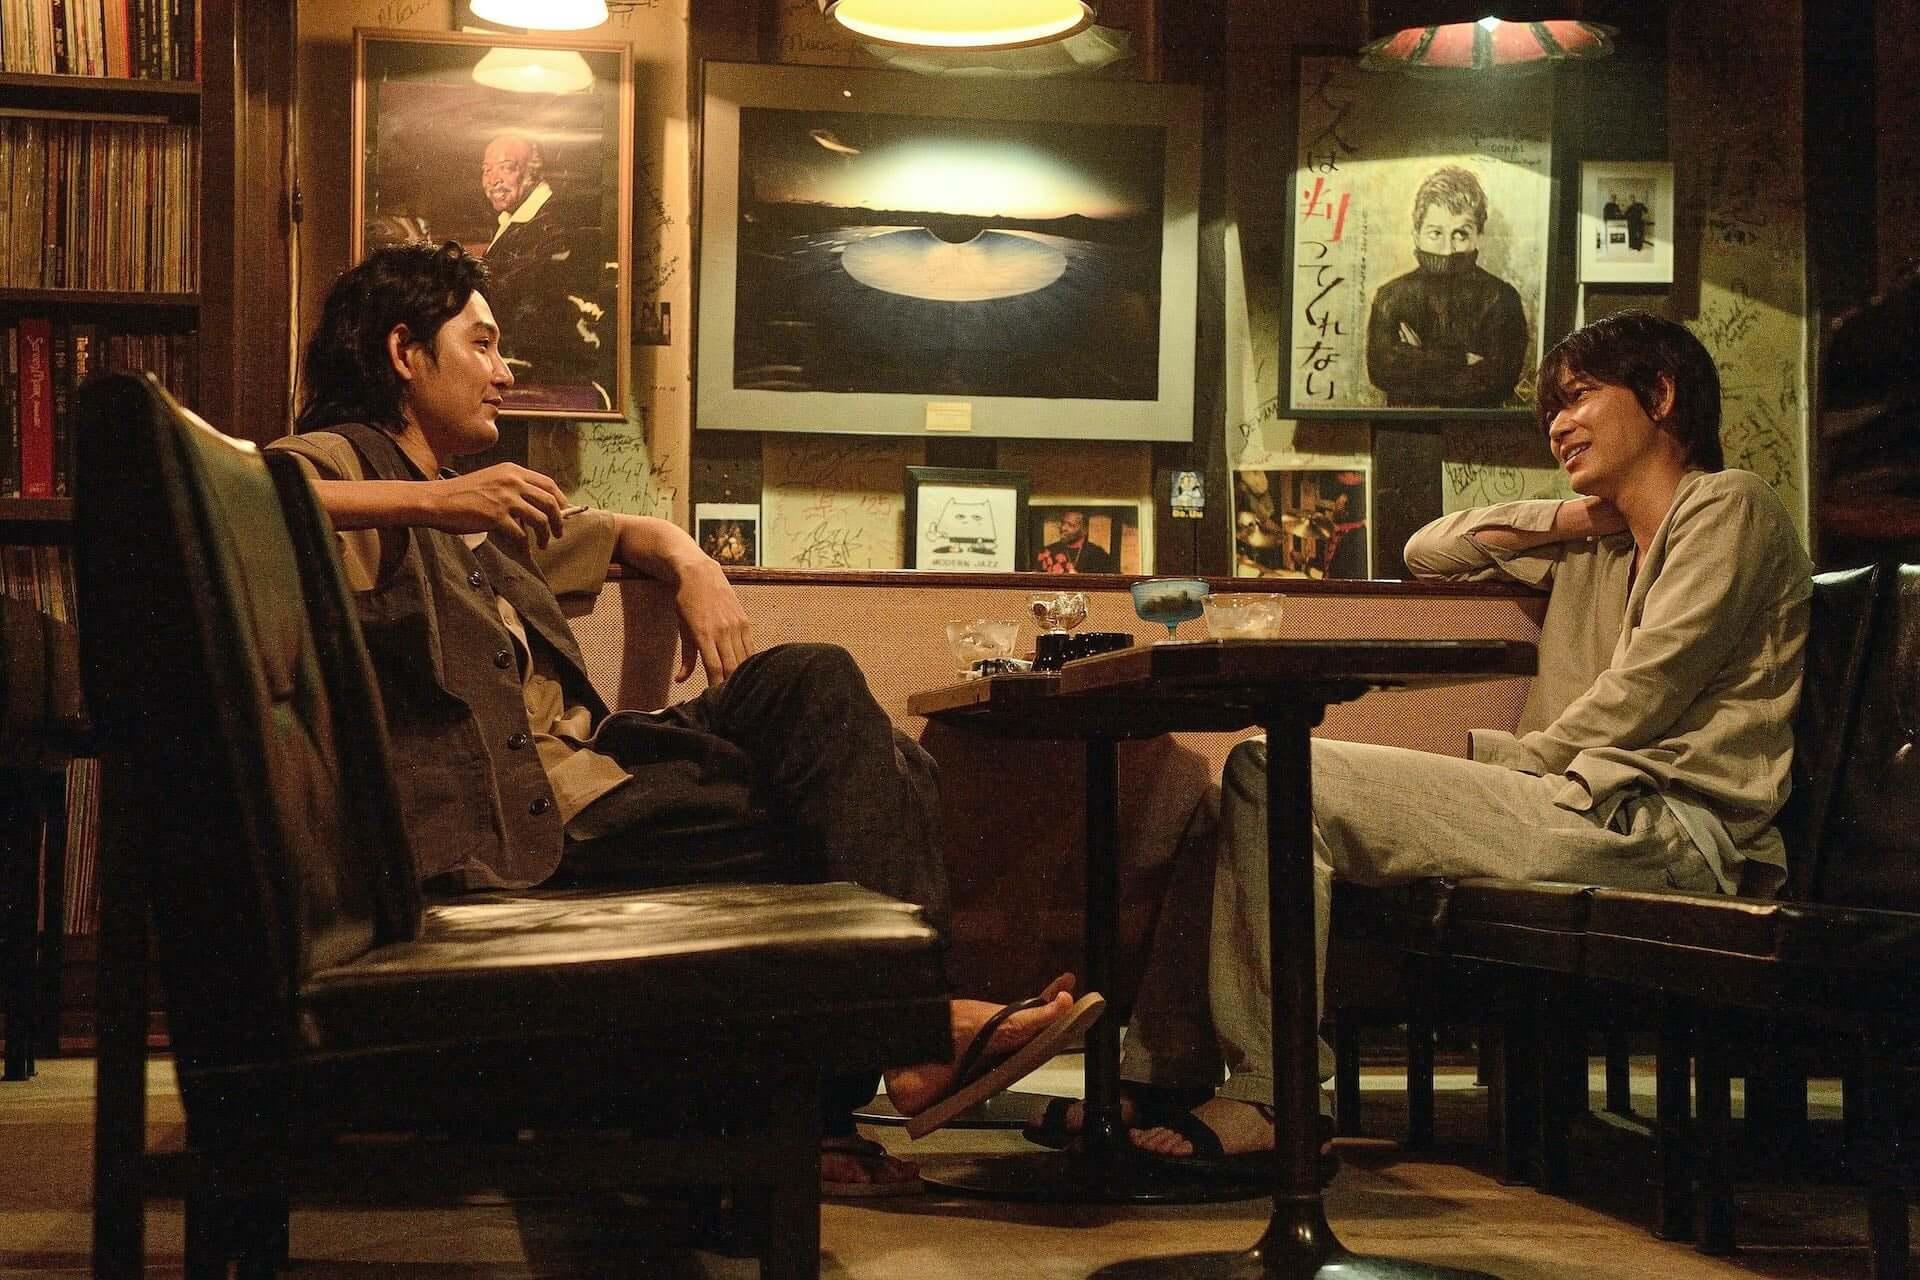 NetflixにThe Notorious B.I.Gのドキュメンタリー『ノトーリアス・B.I.G. -伝えたいこと-』や『翔んで埼玉』など続々登場!3月配信作品が解禁 film210226_netflix_7-1920x1280